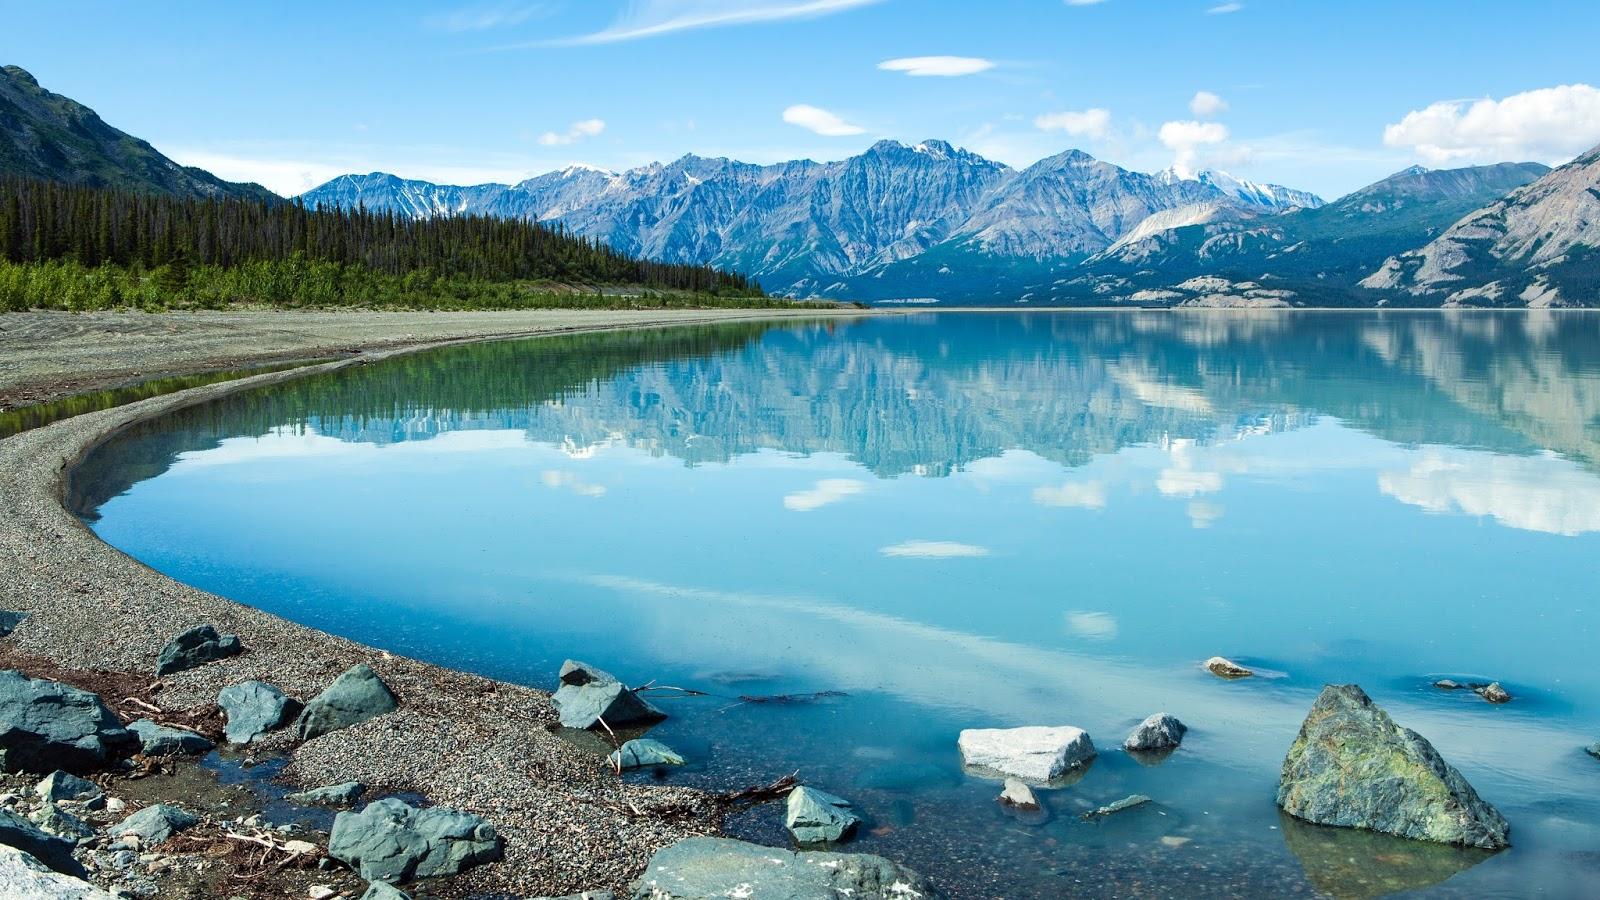 Kluane Lake Canada 5120 x 2880